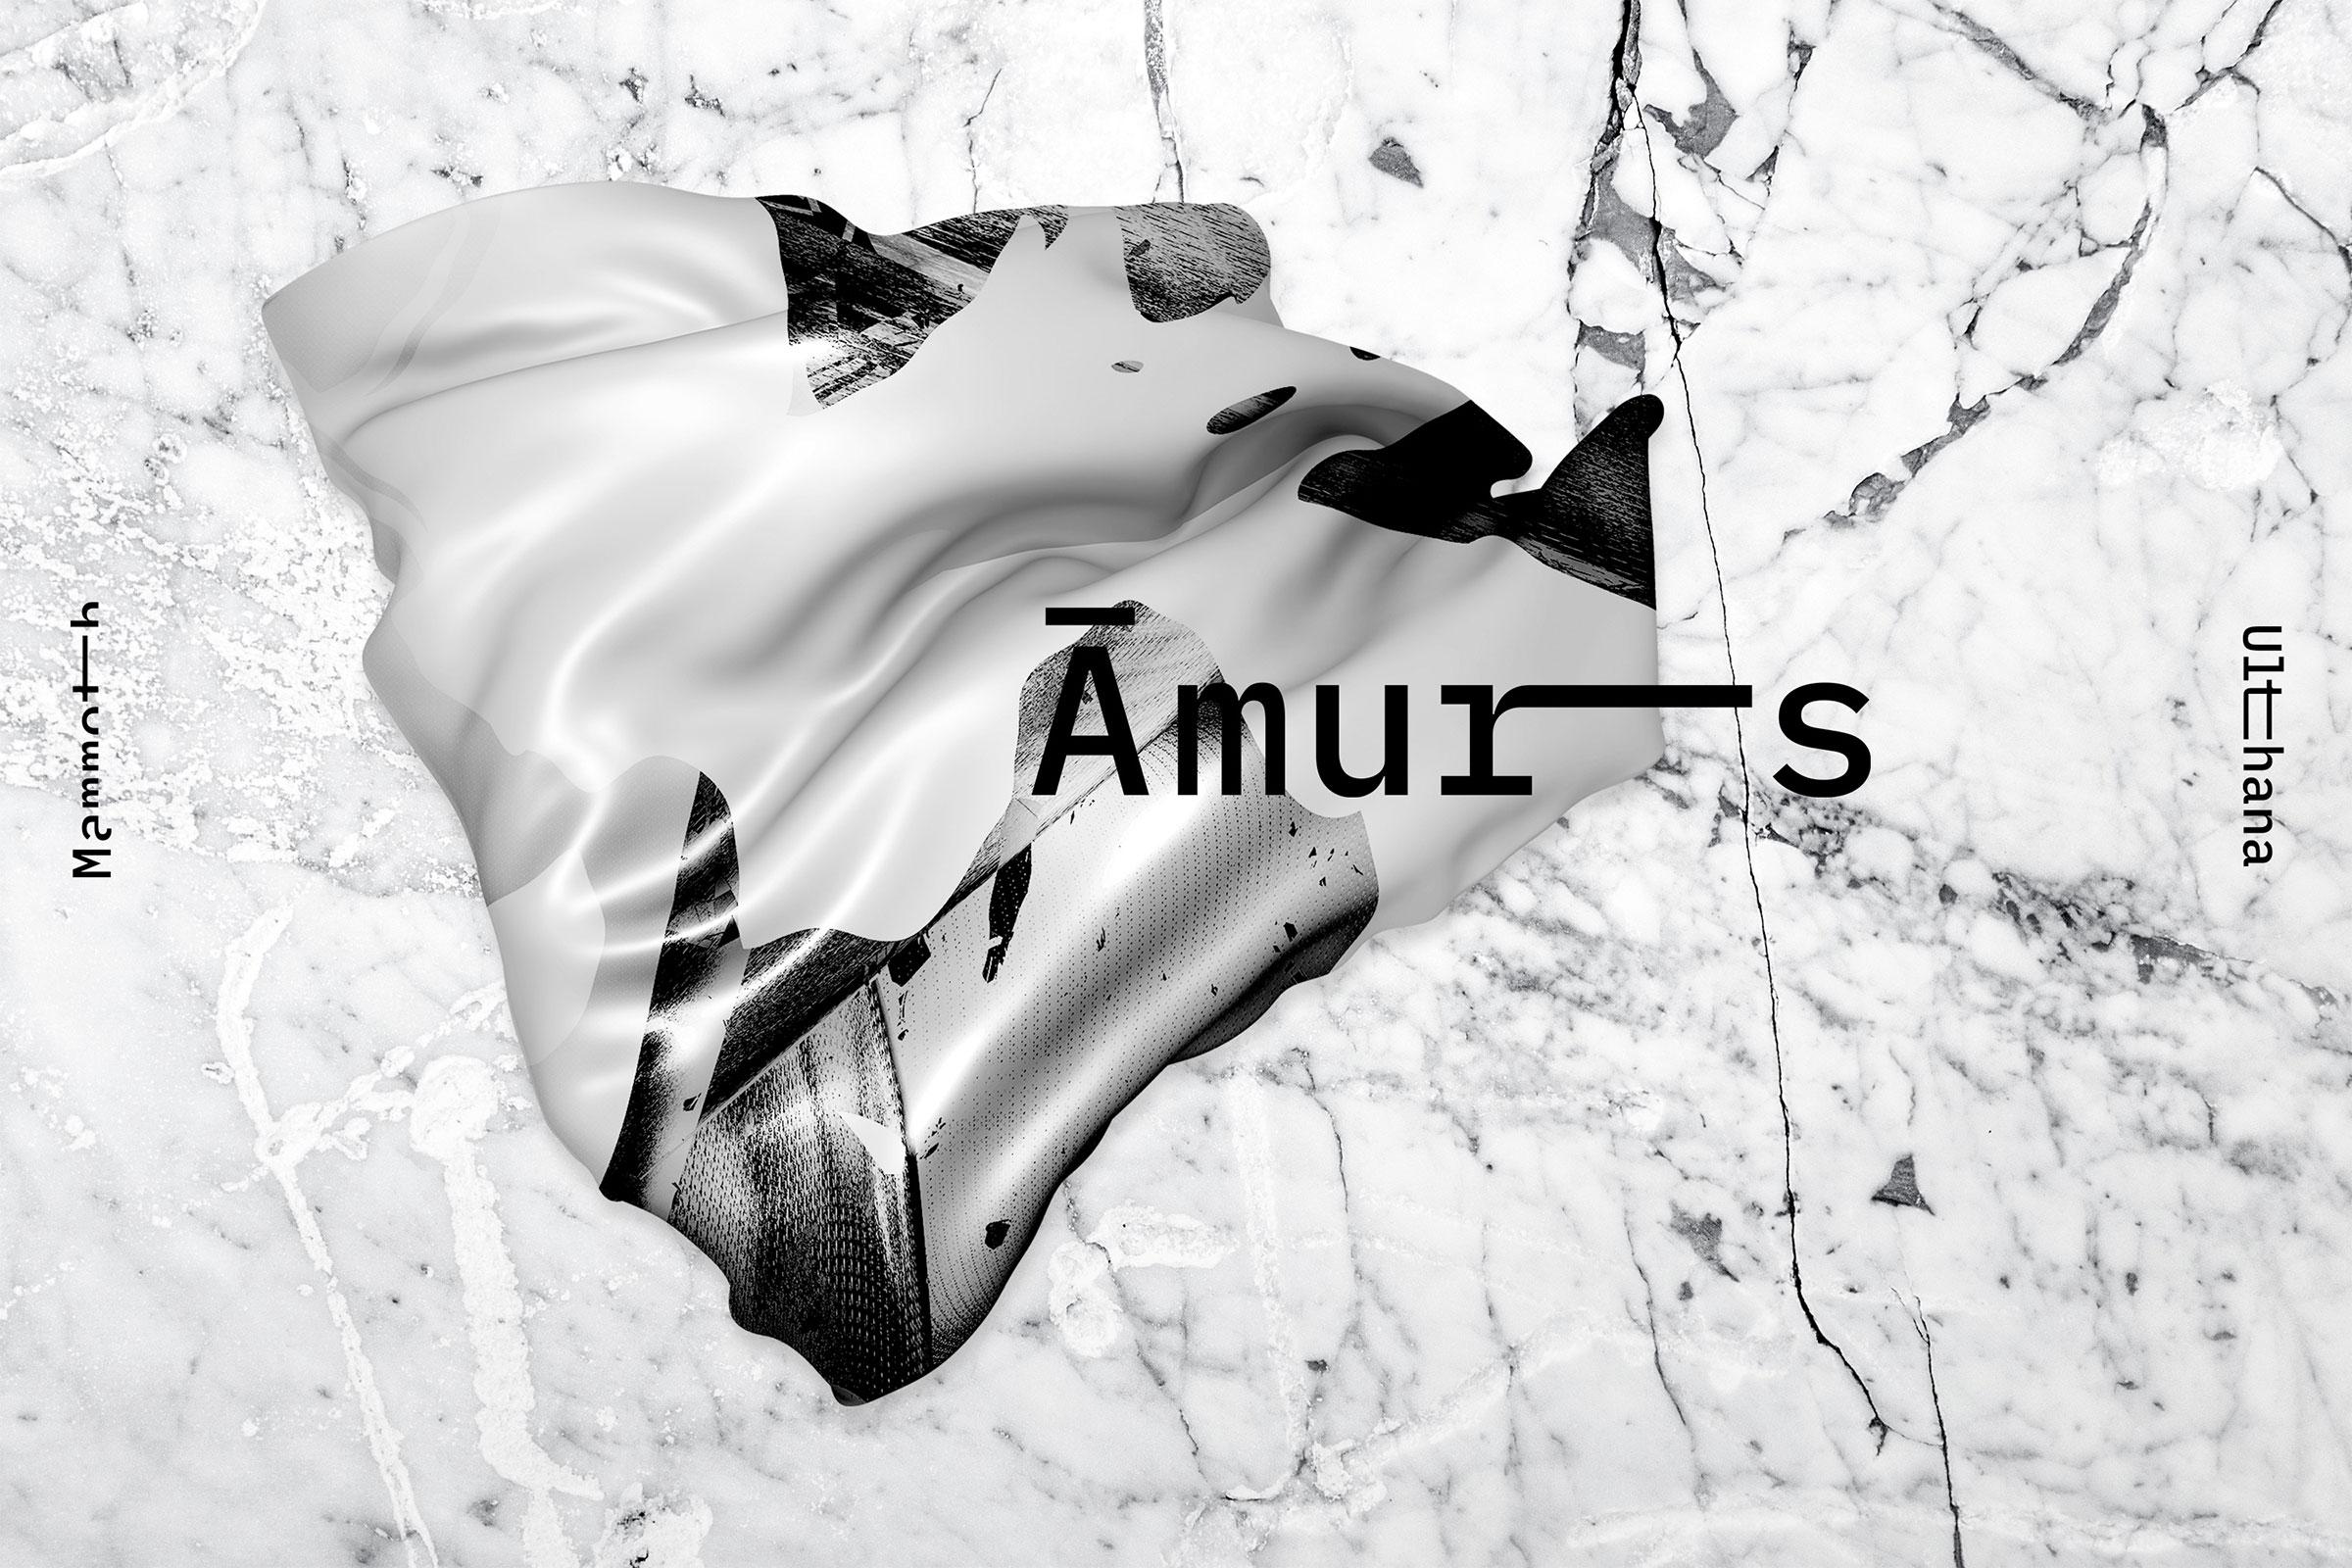 Jacek Doroszenko - Amurs, Mammoth Ulthana, contemporary music 02